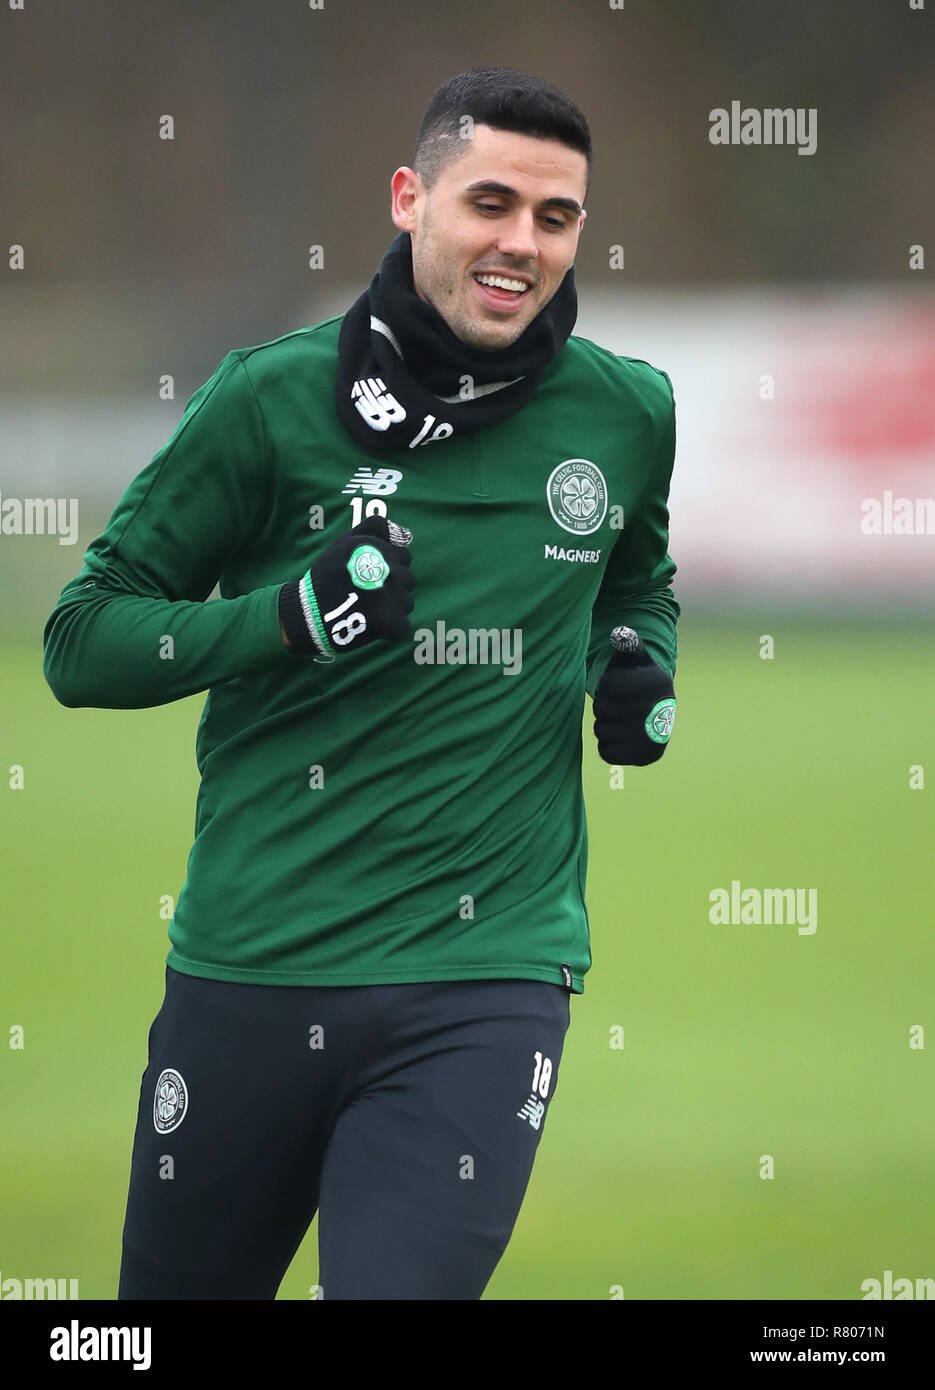 Celtic's Tom Rogic during the training session at Lennoxtown, Glasgow. - Stock Image